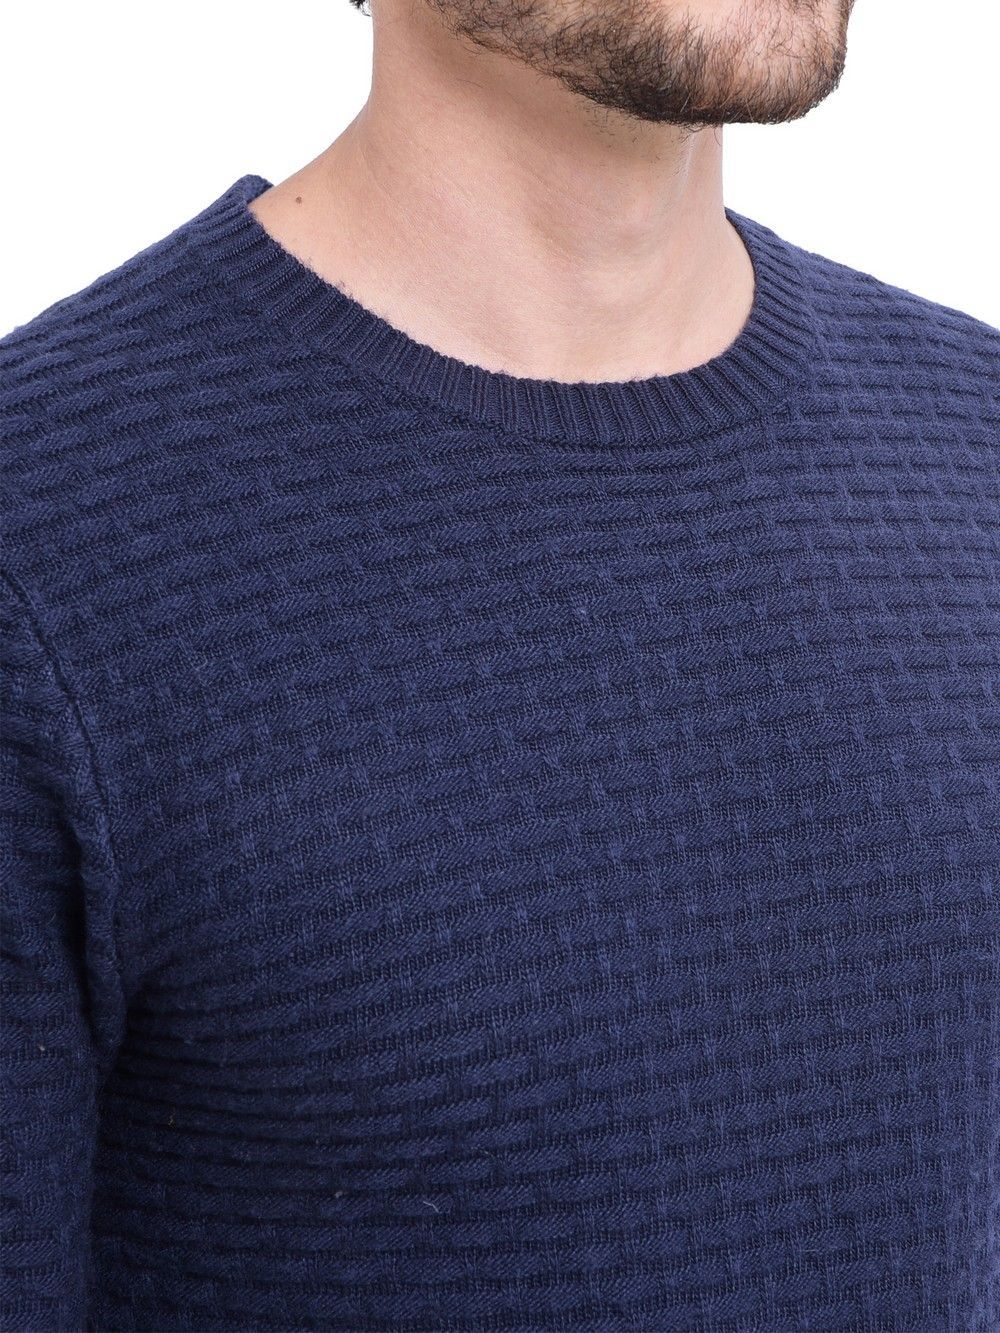 William De Faye Round Neck Jacquard Sweater in Navy